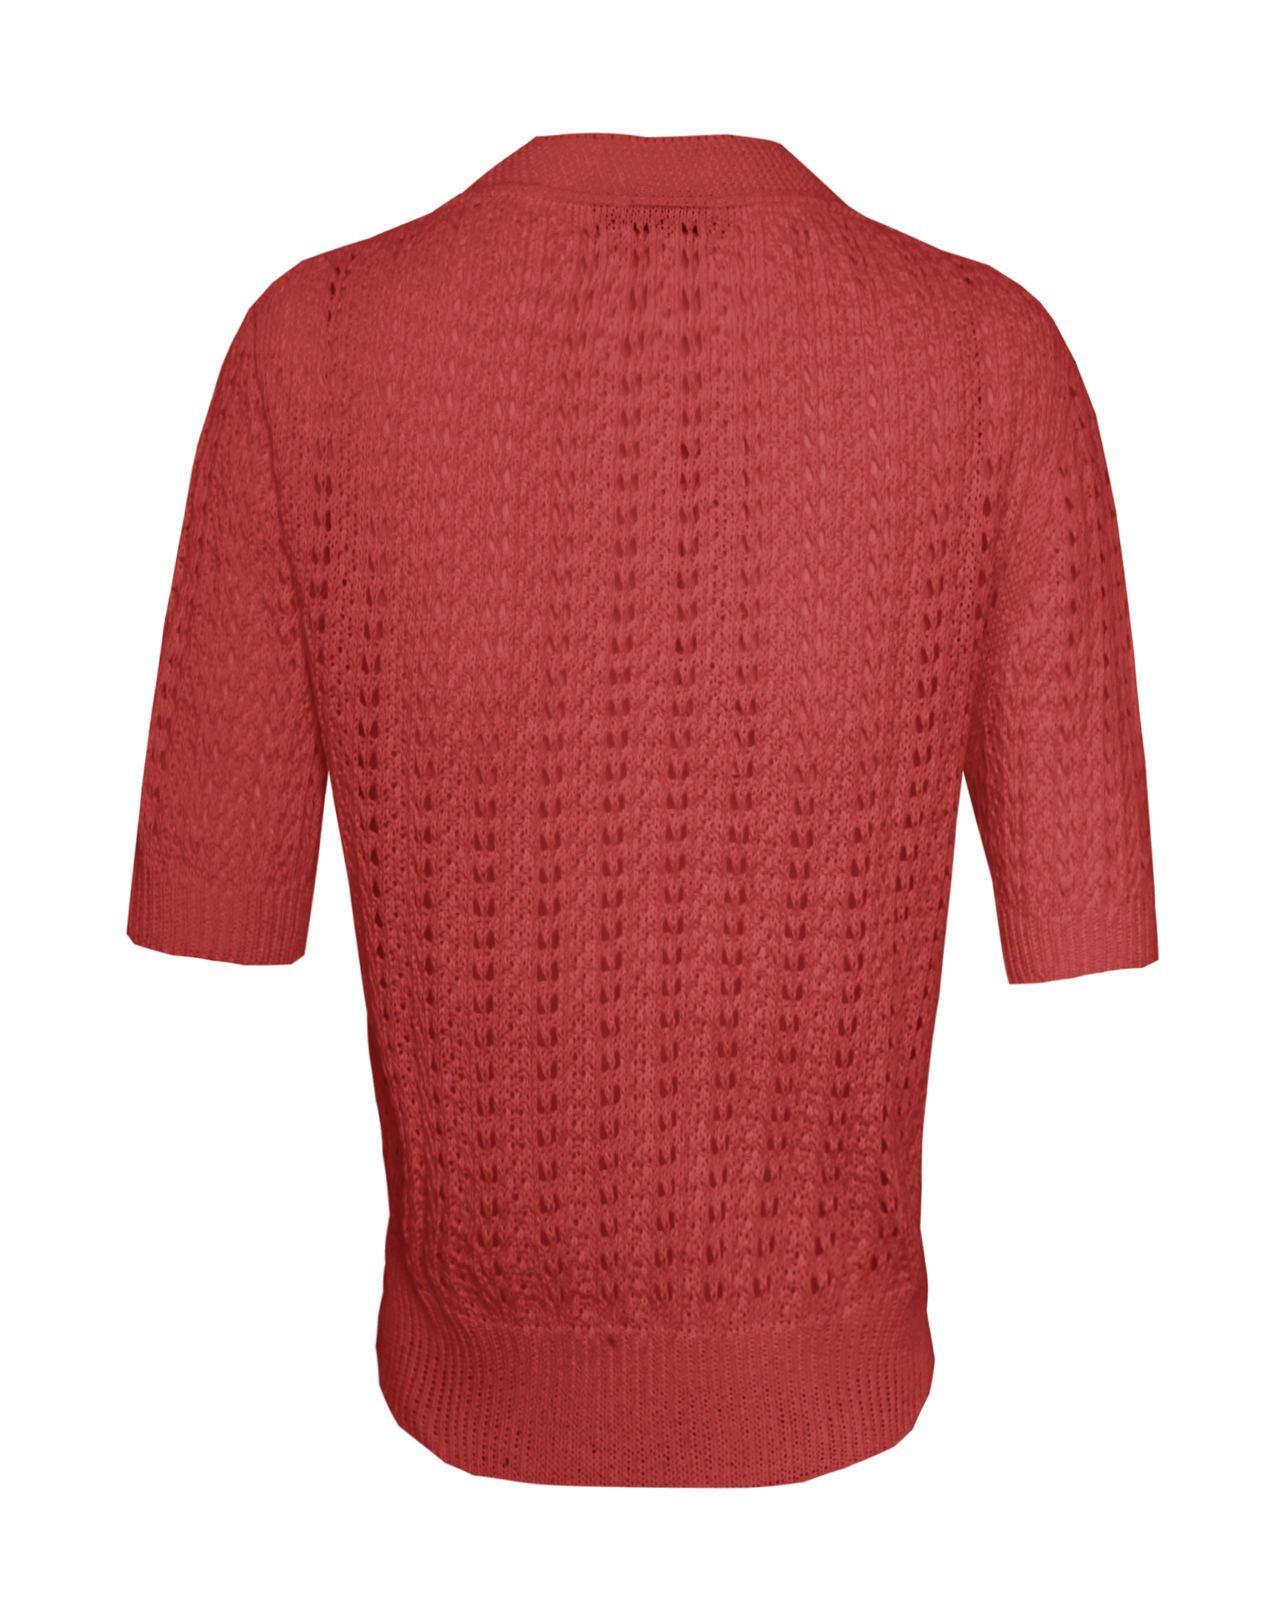 Mesdames-crochet-tricote-pour-femme-manches-courtes-hausser-brooched-cardigan-crop-top-8-14 miniature 6